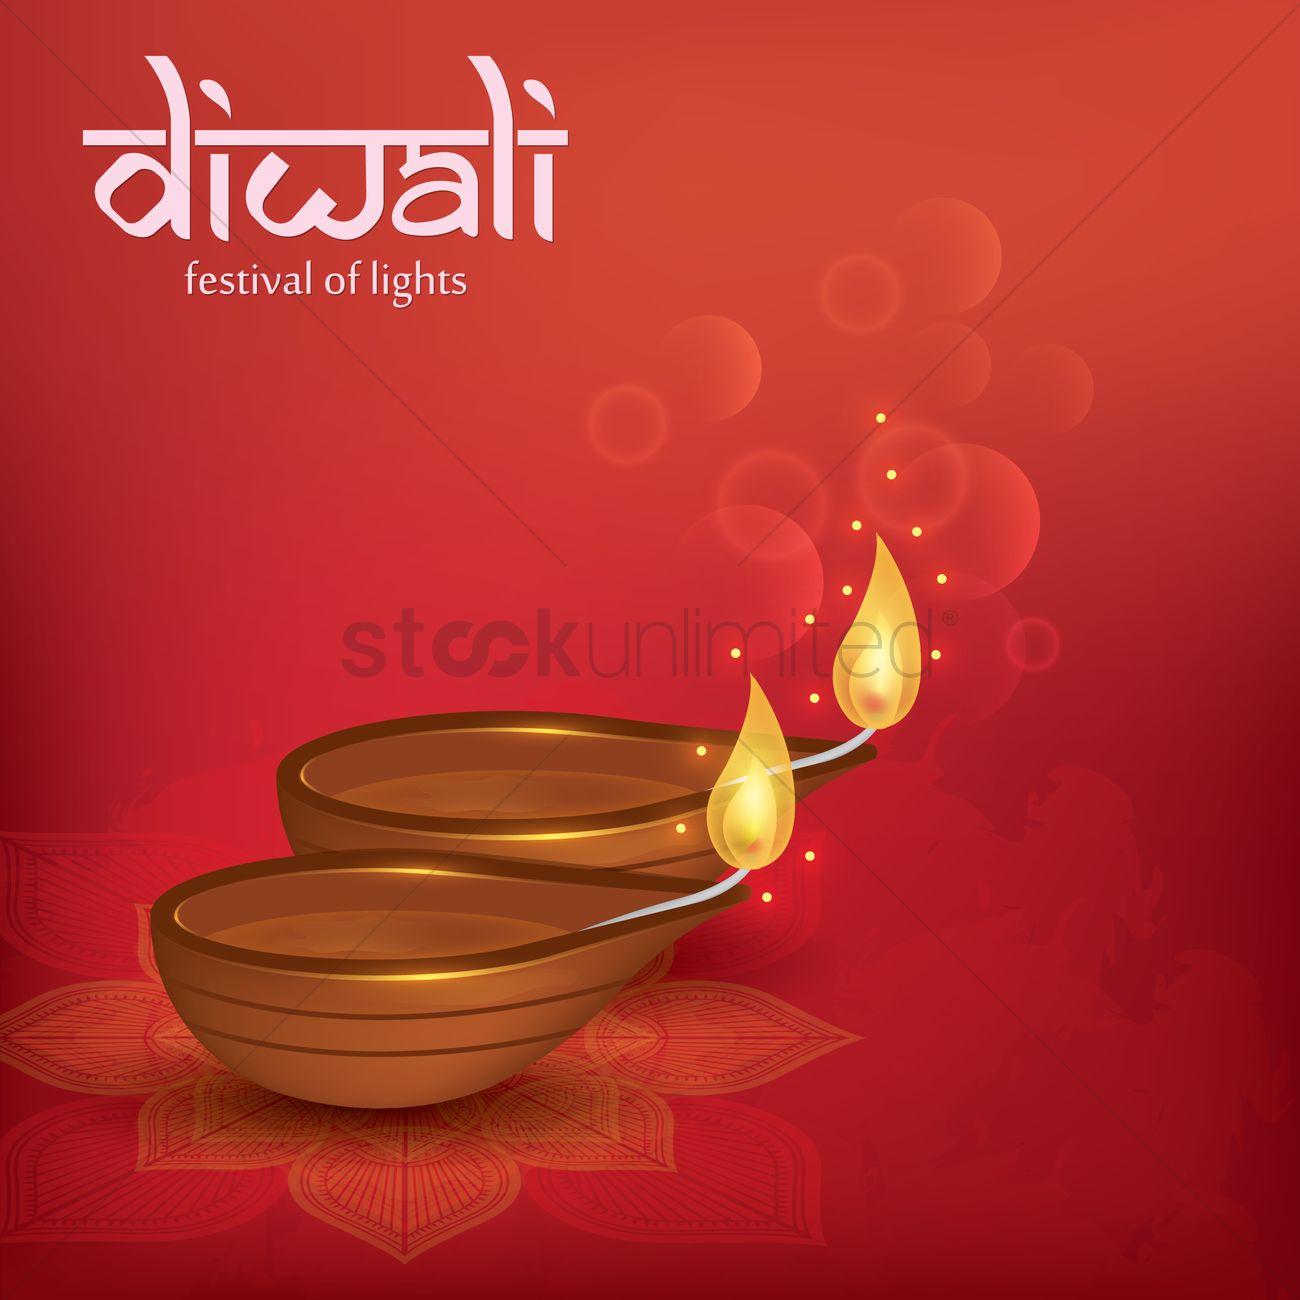 Happy Diwali Greeting Design Vector Image 1989782 Stockunlimited